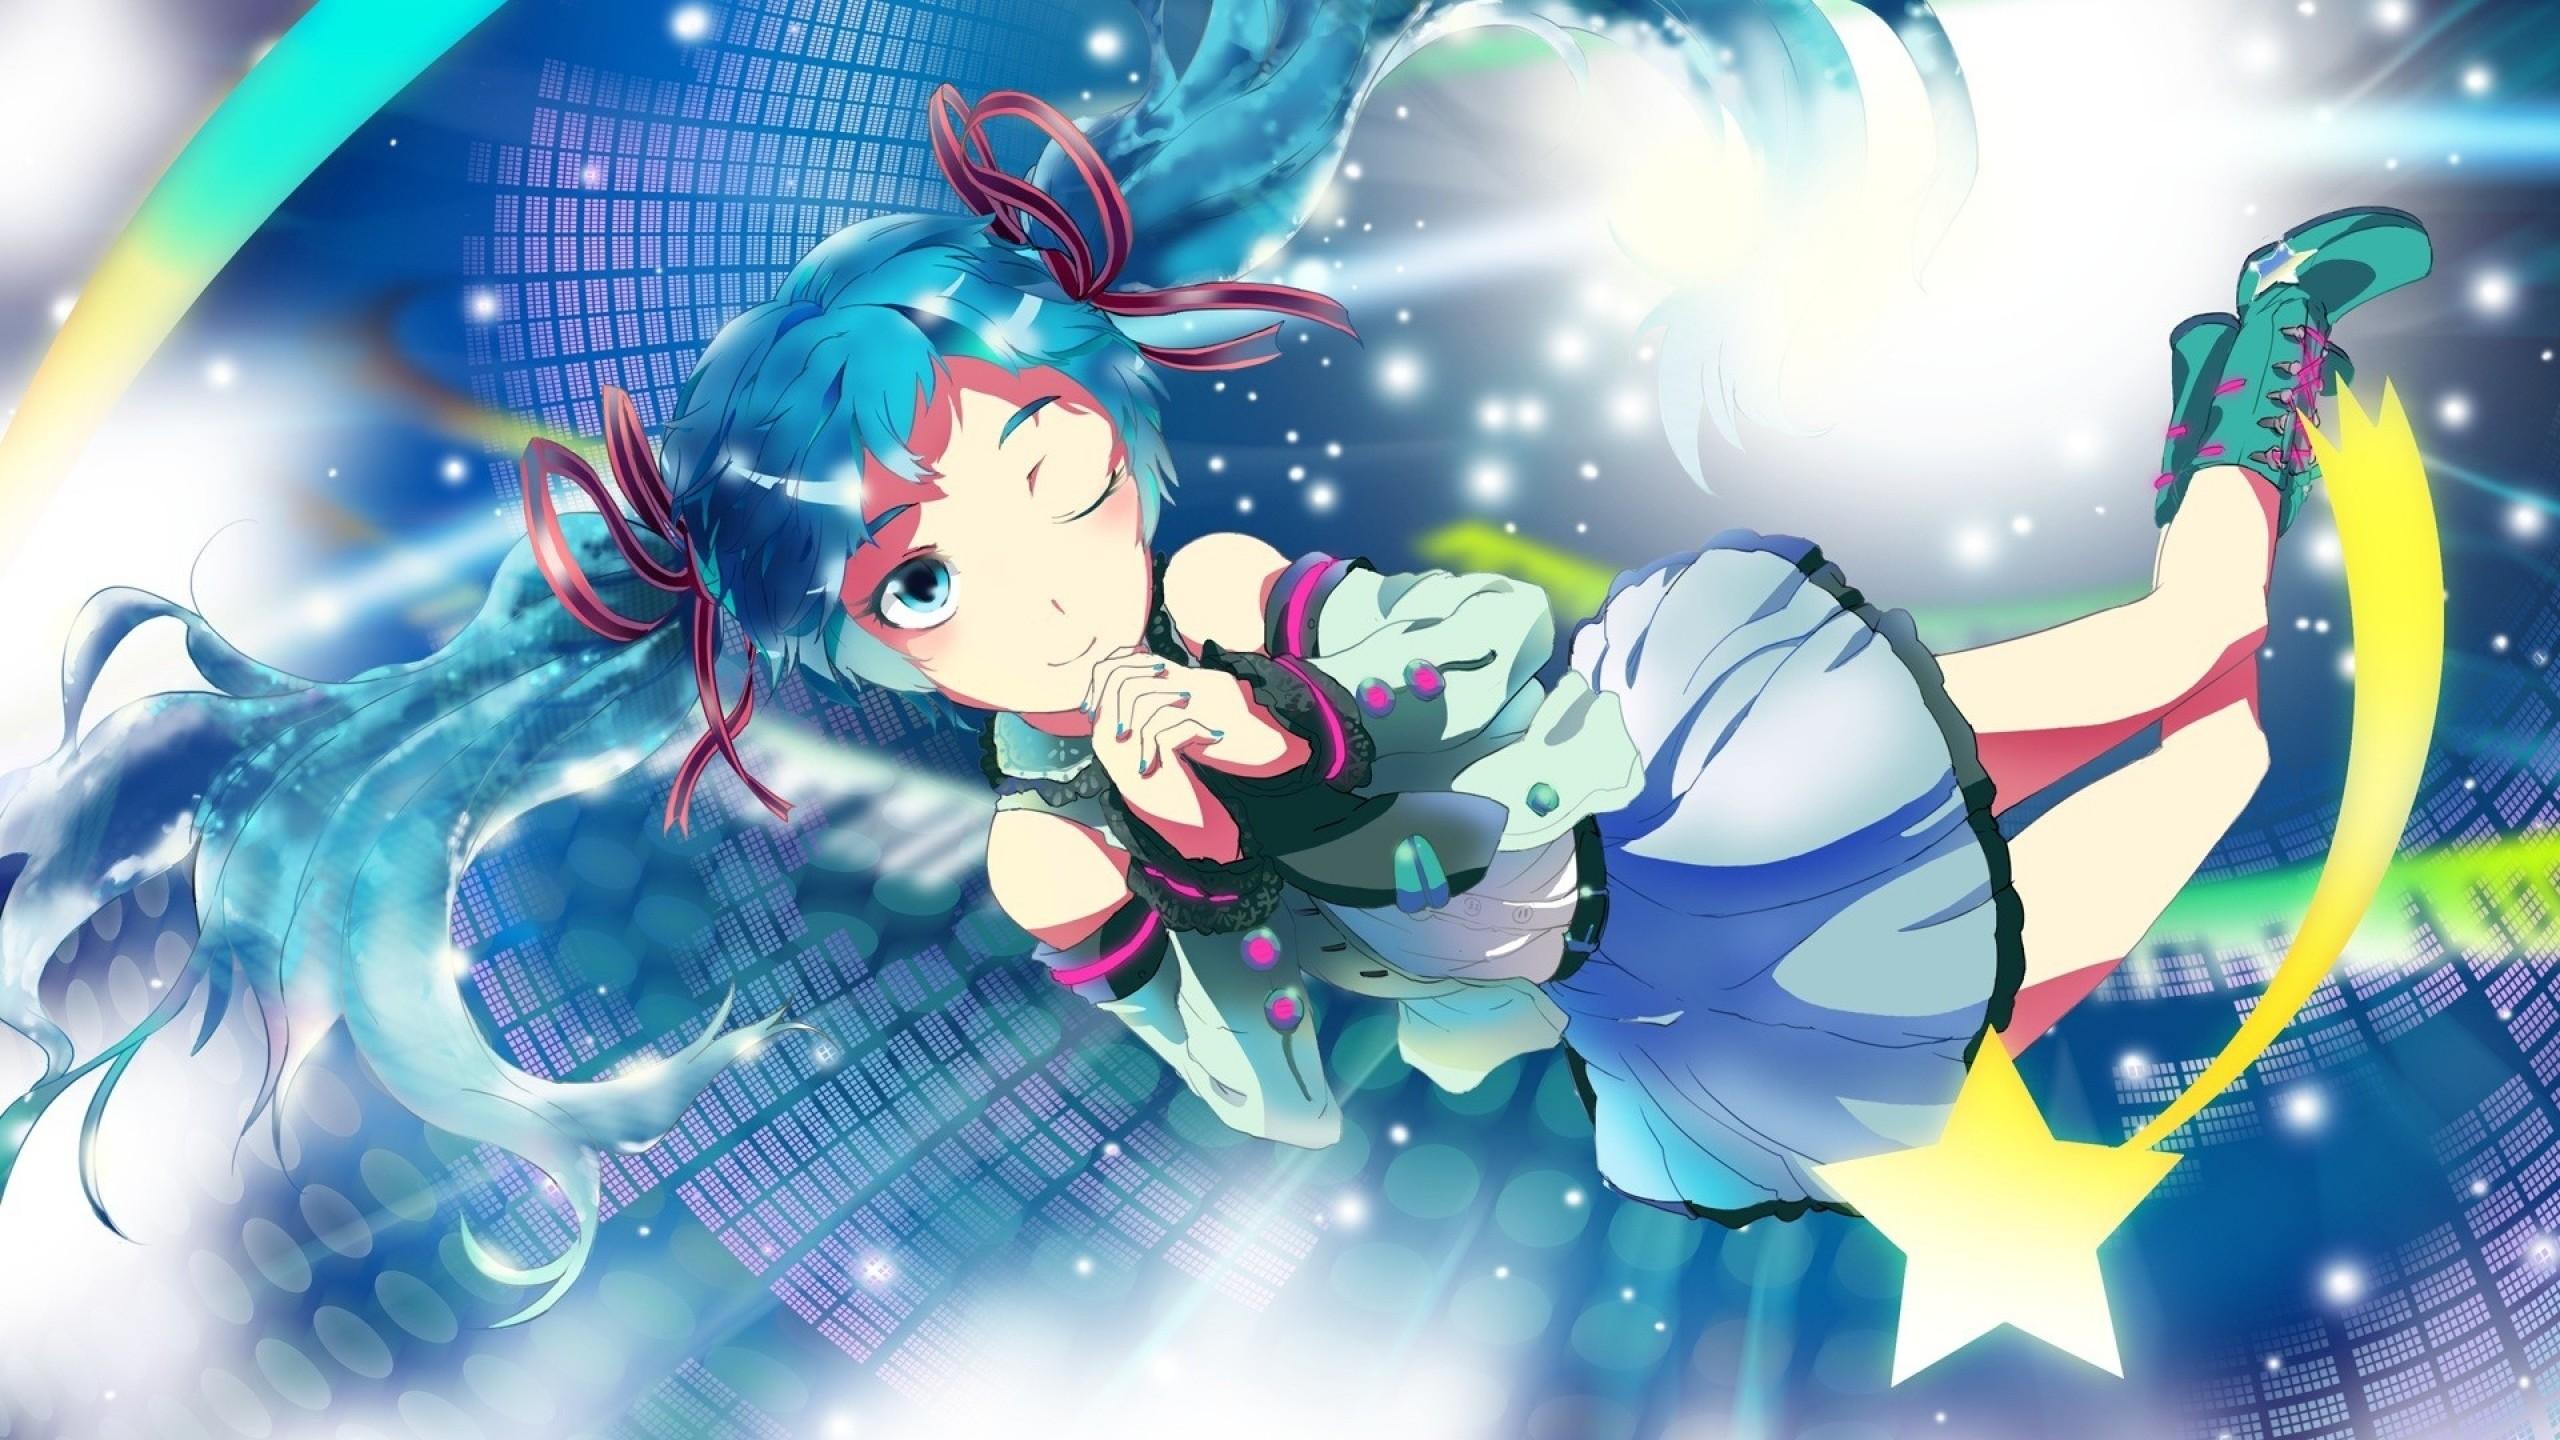 Wallpaper vocaloid, hatsune miku, anime